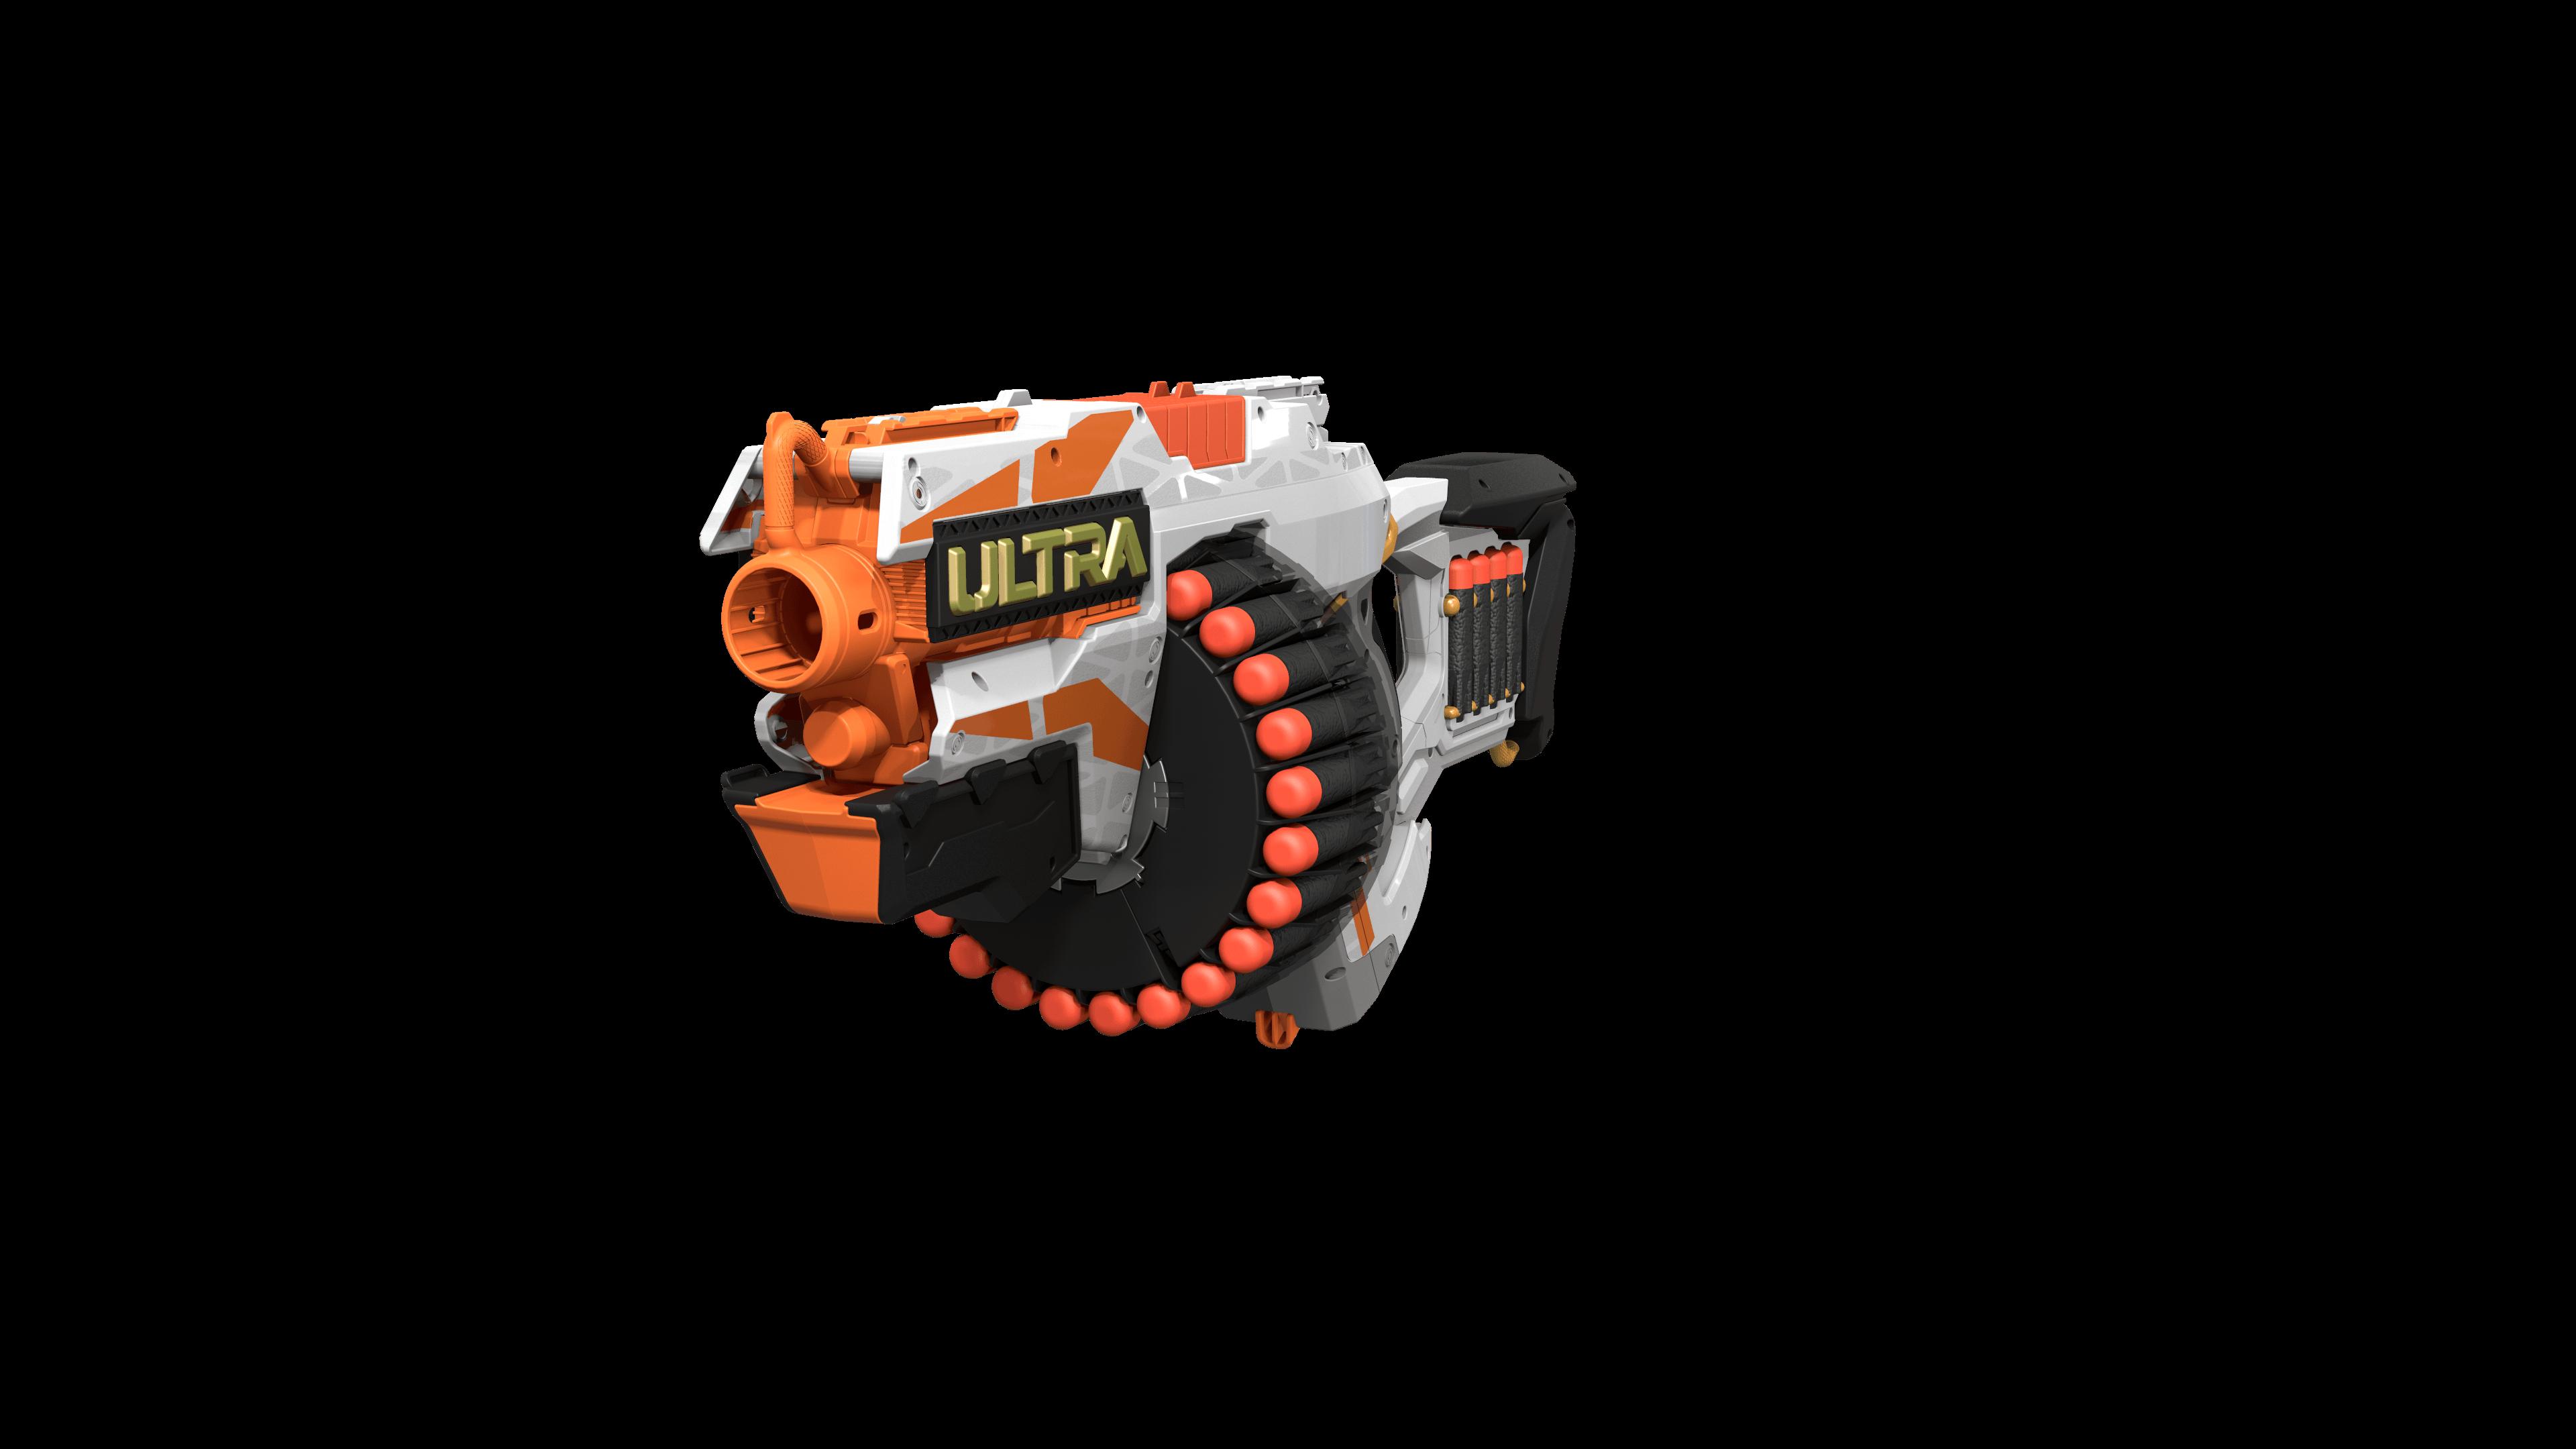 ultra blaster img 84